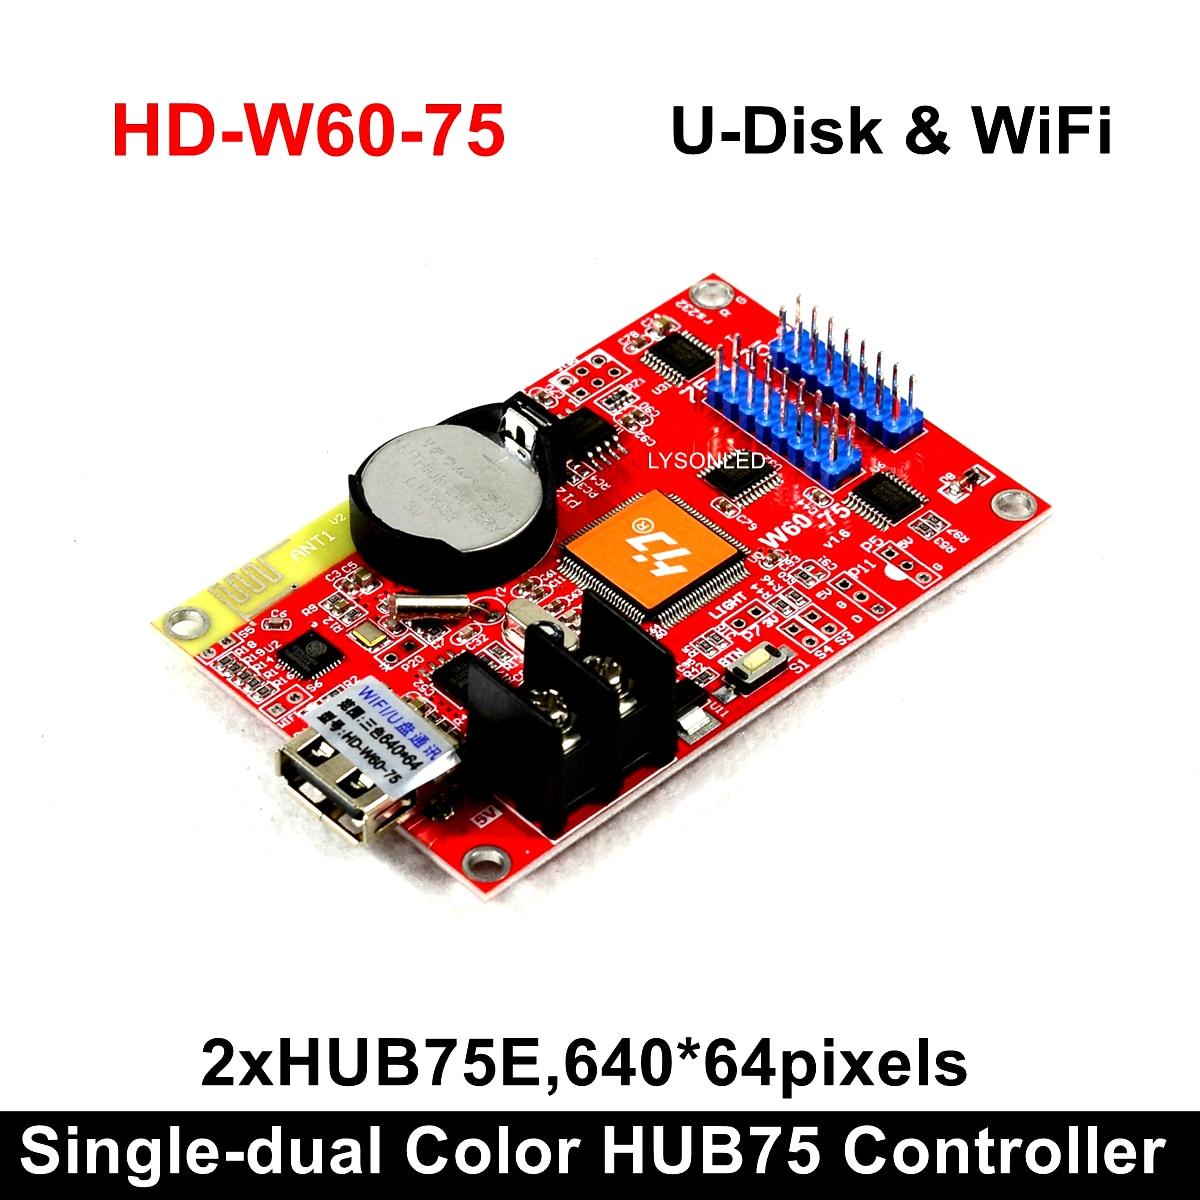 HD-W60-75 Hub75B Ports Small Graphic Wifi Wireless LED Control Card Smart Setting